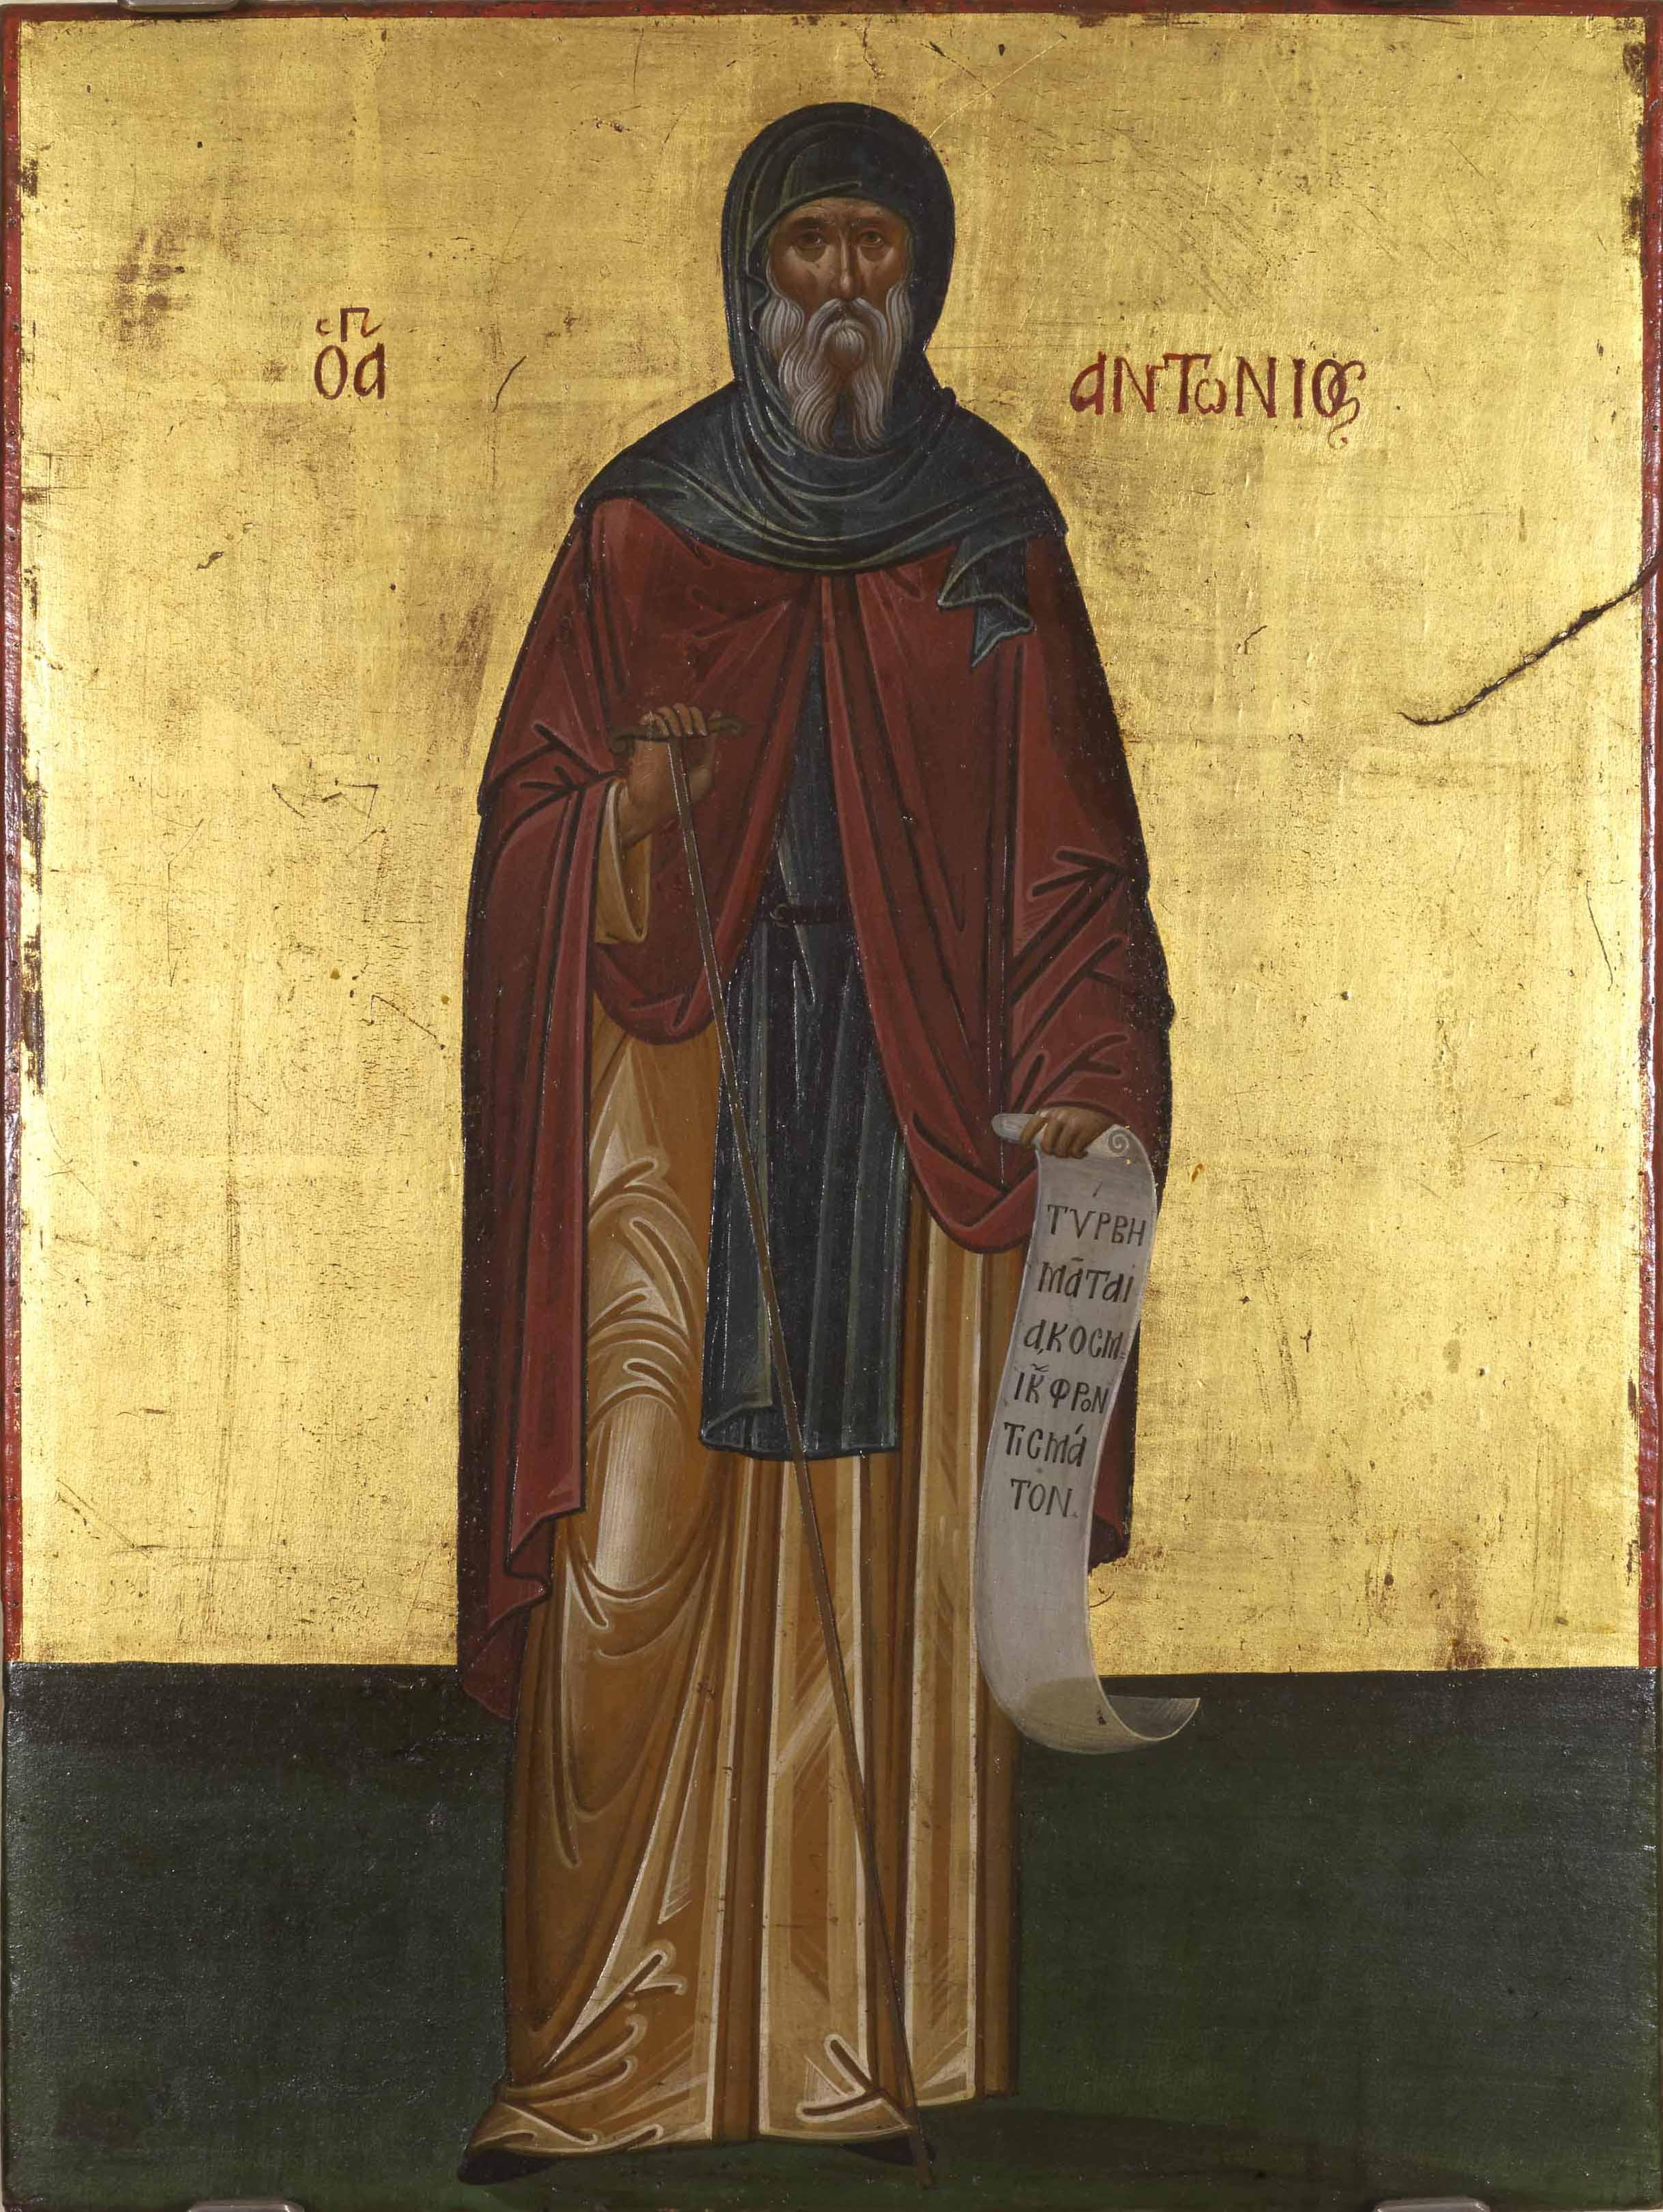 30 января 2020 отмечается Антон-перезимник, Антонина-половина